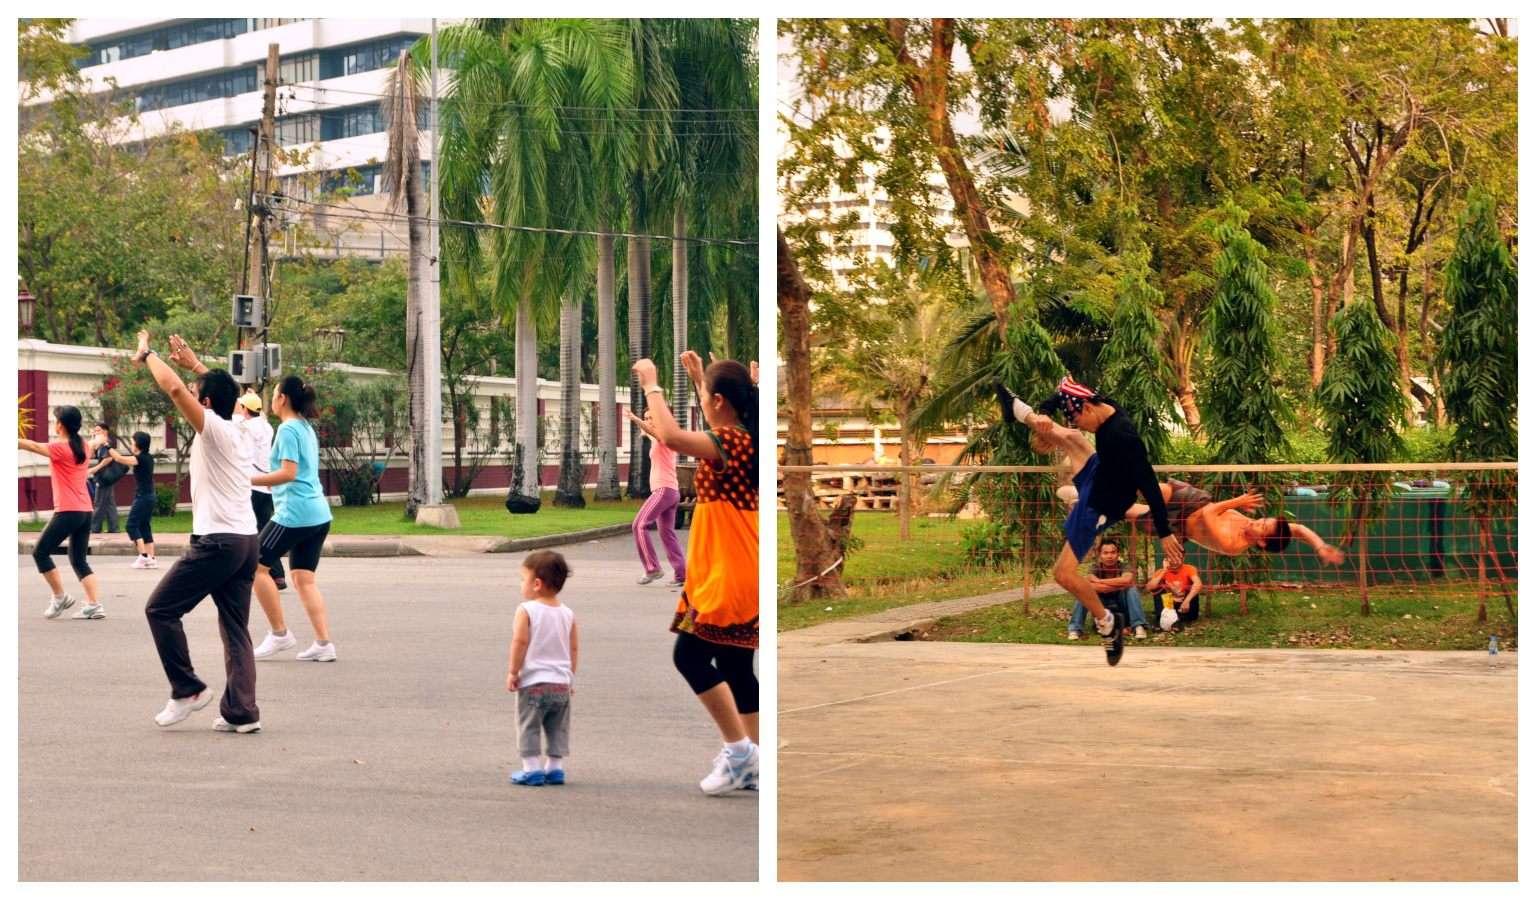 Beweging in het Lumphini Park in Bangkok, Thailand